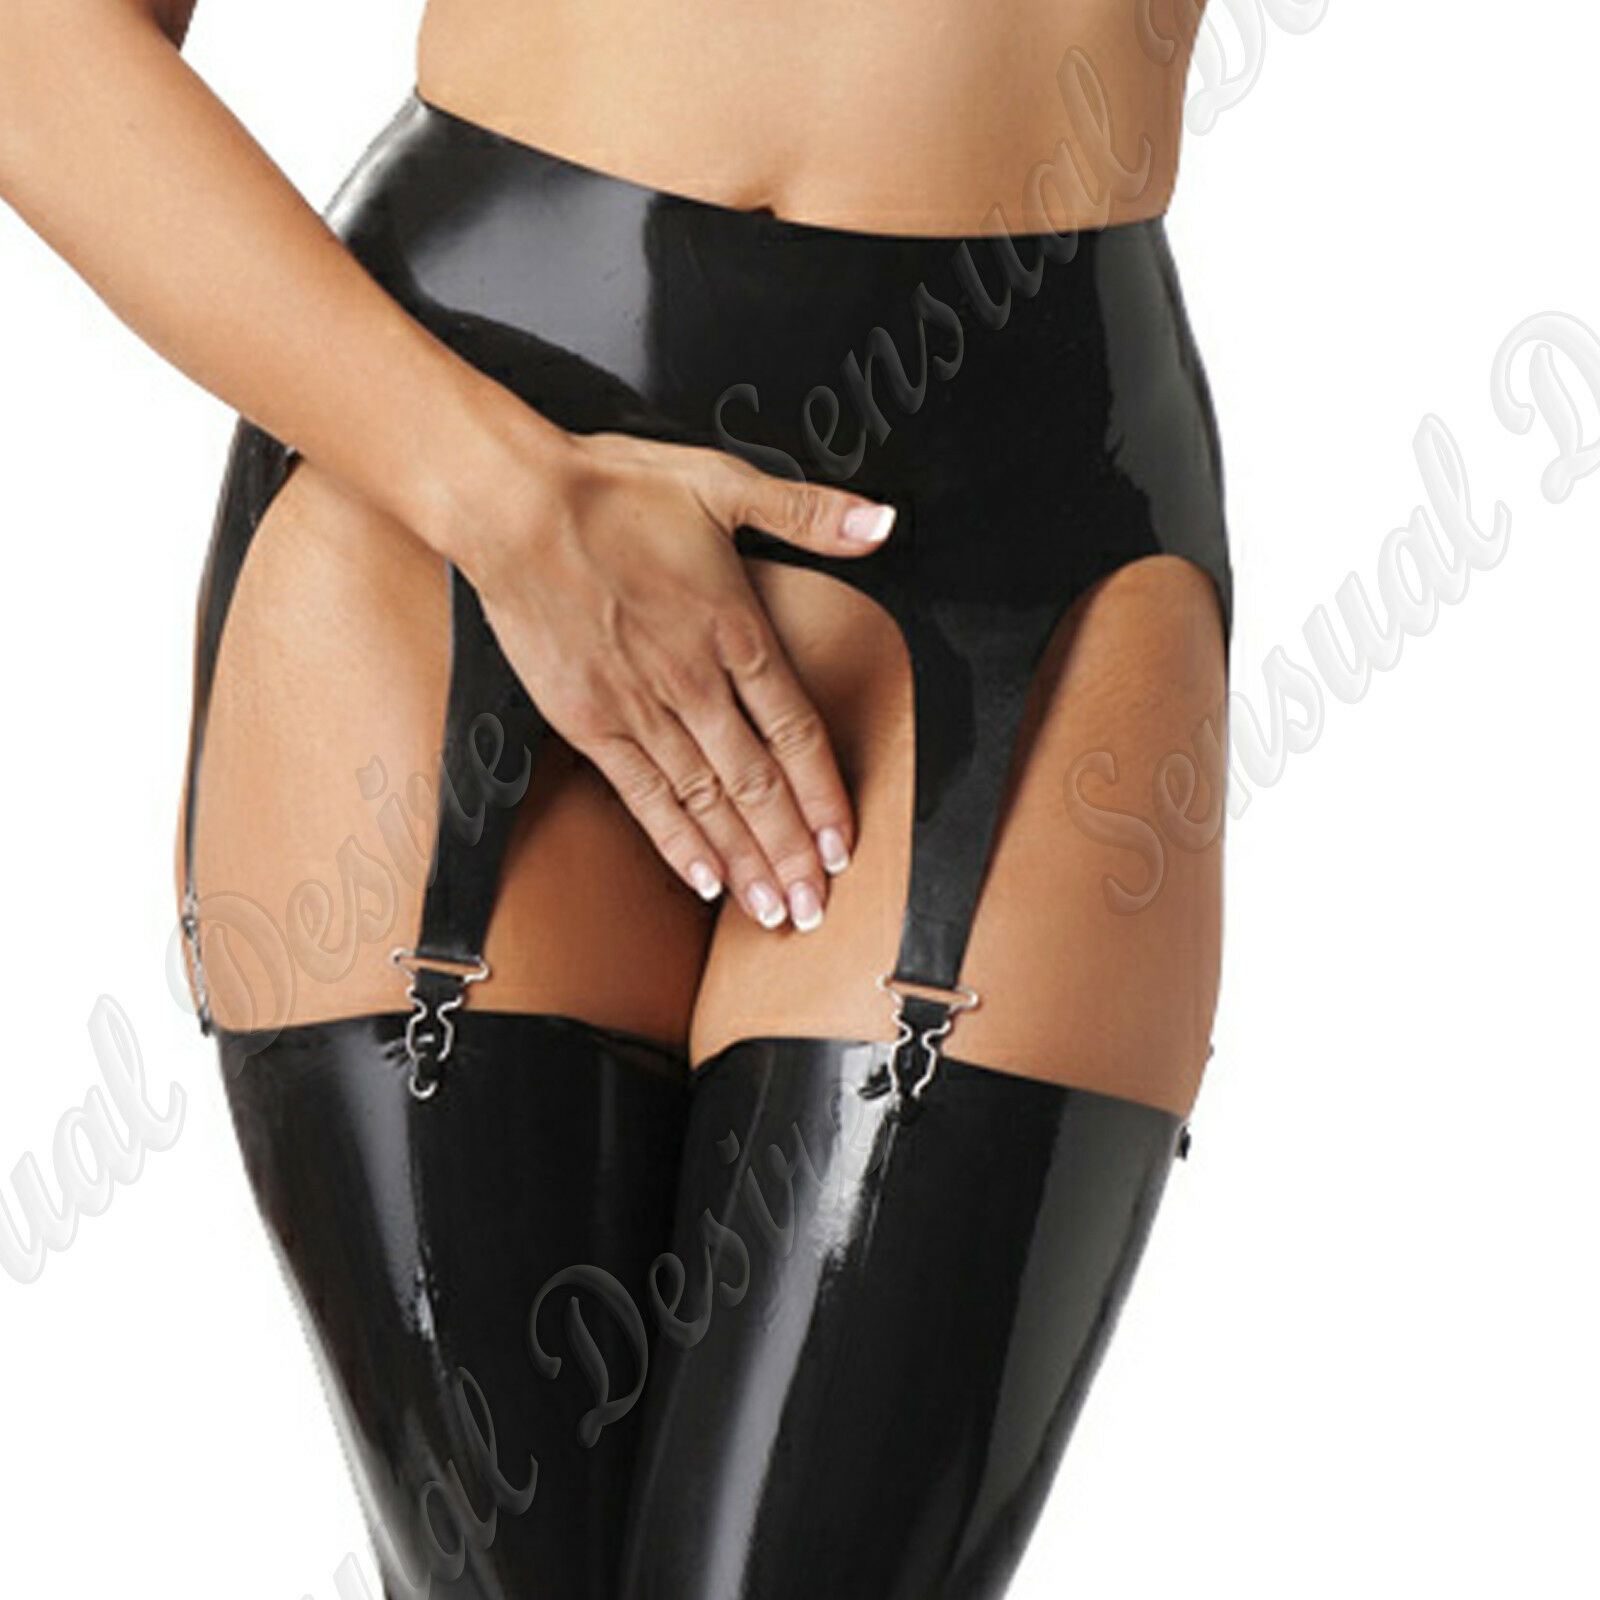 Latex Rubber Secrets Suspender Belt  Fun Eredic Seductive Club Wear Role Play